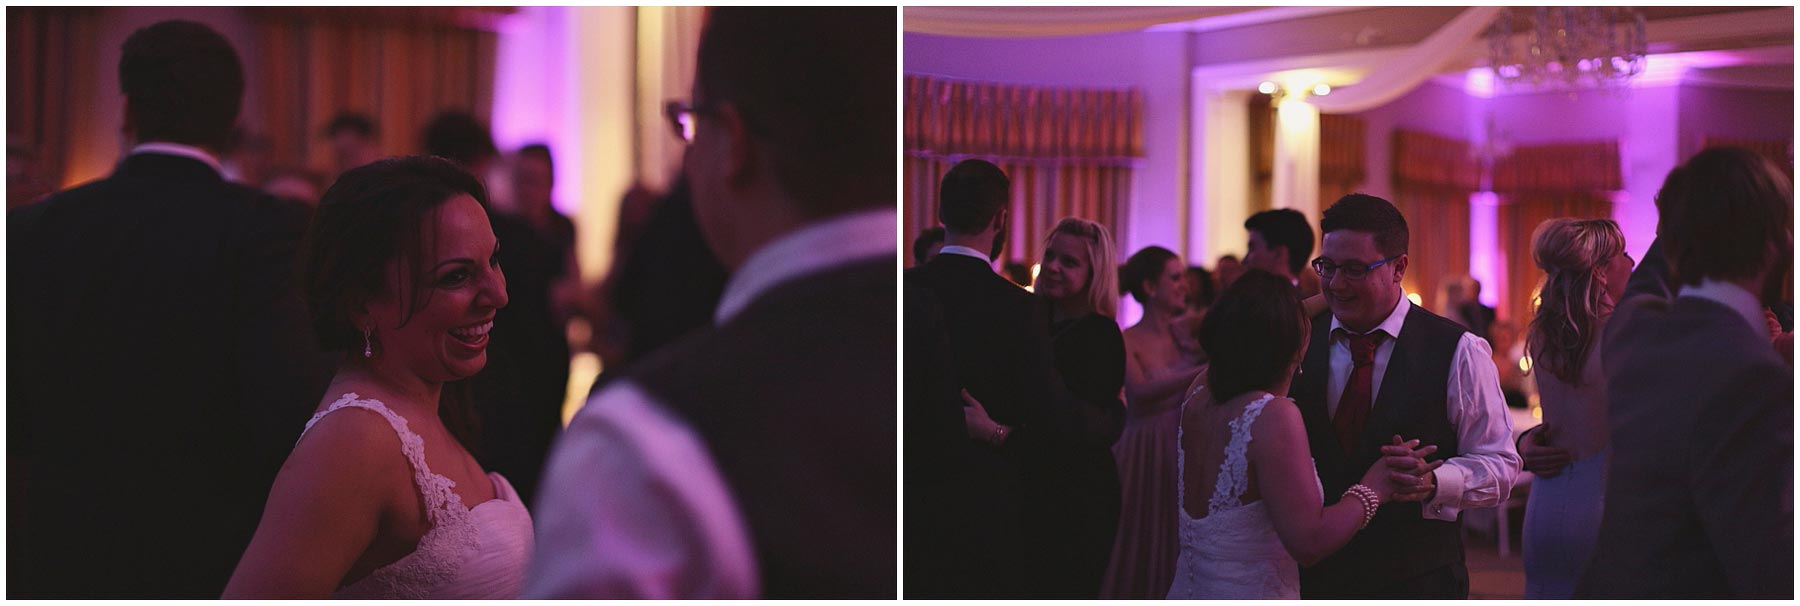 Rudding-Park-Wedding-Photography_0117